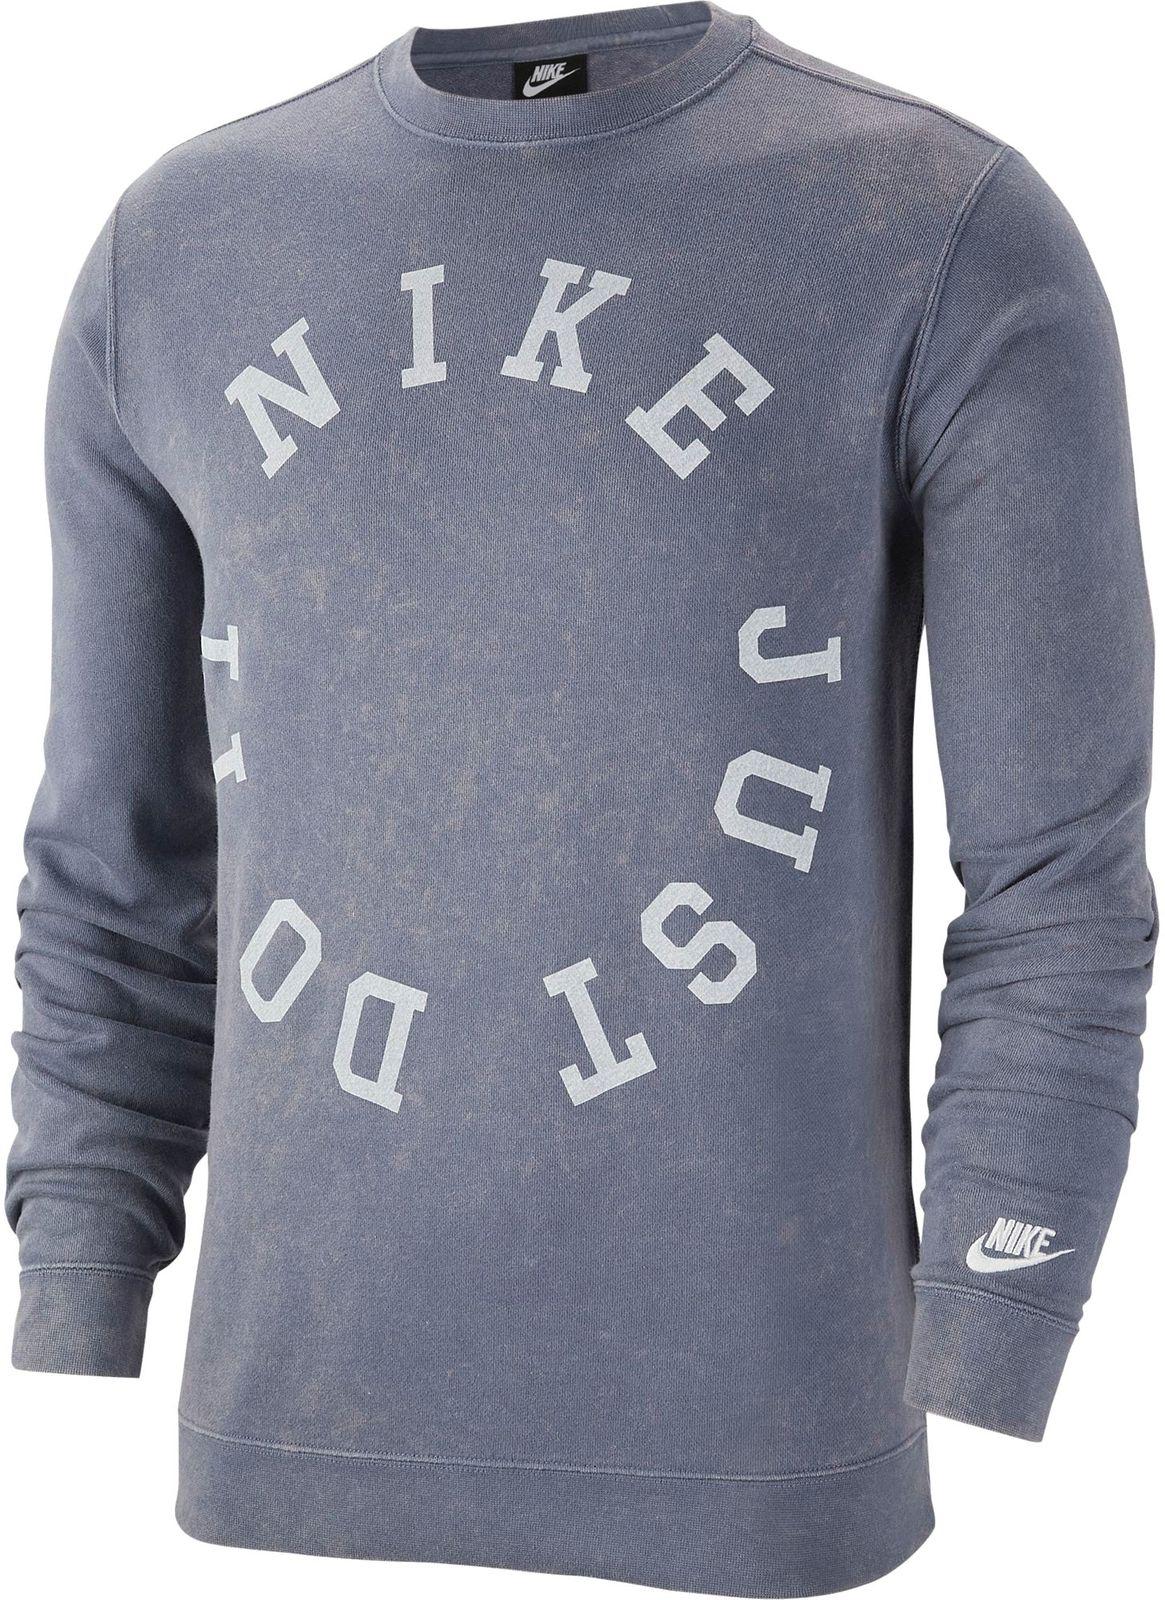 Details about Nike Men's Sport Freizeit Pullover Sweatshirt Ce Cr French Terry Sweat Blue